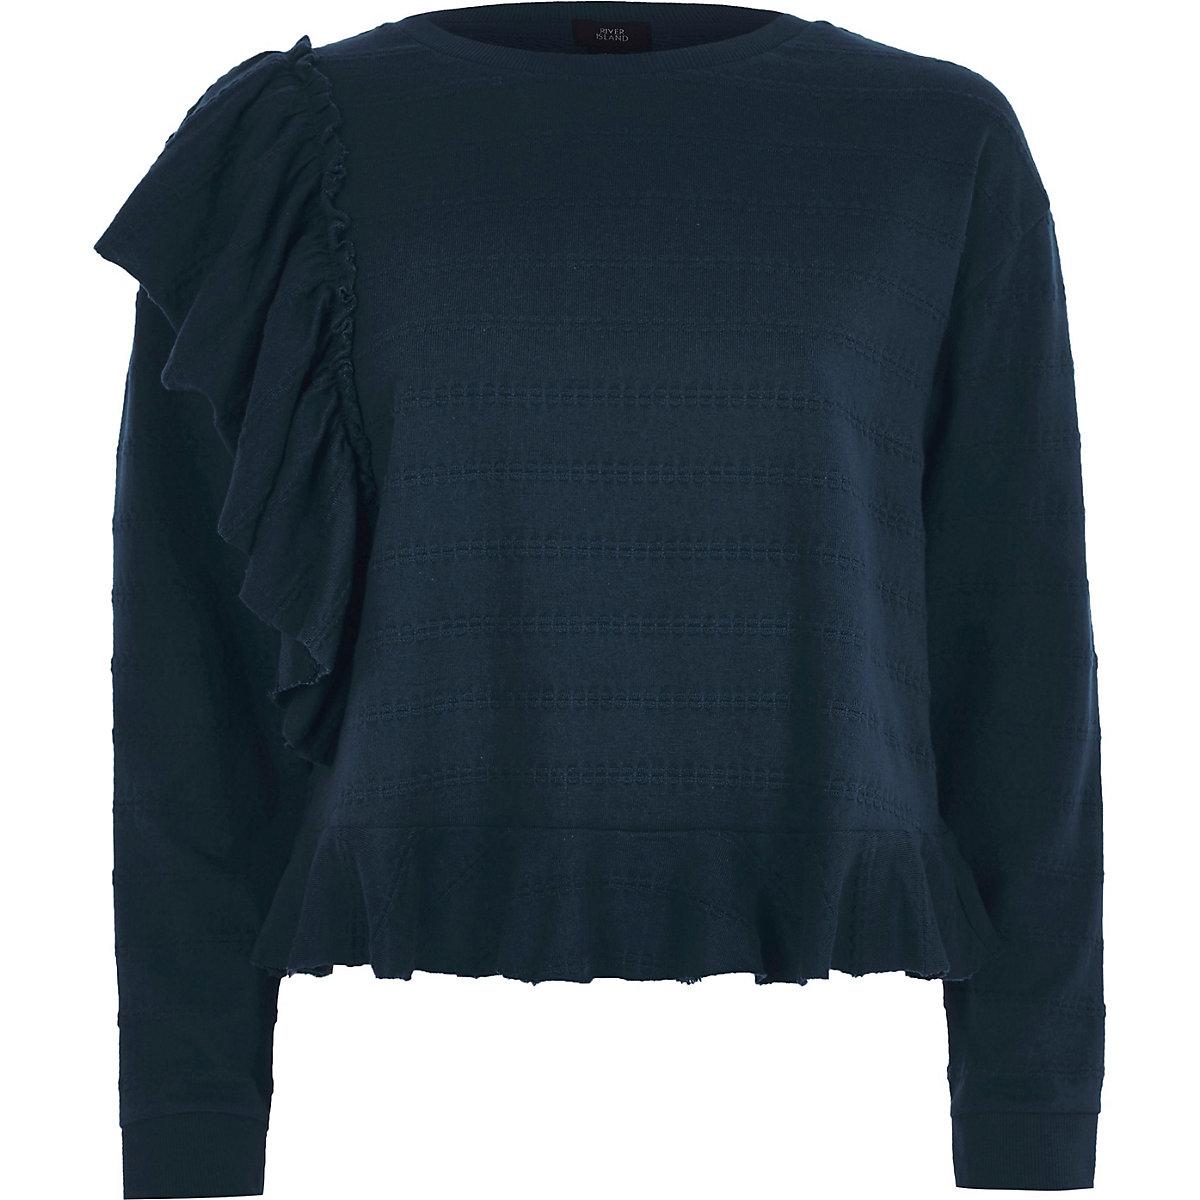 Navy jacquard frill long sleeve top